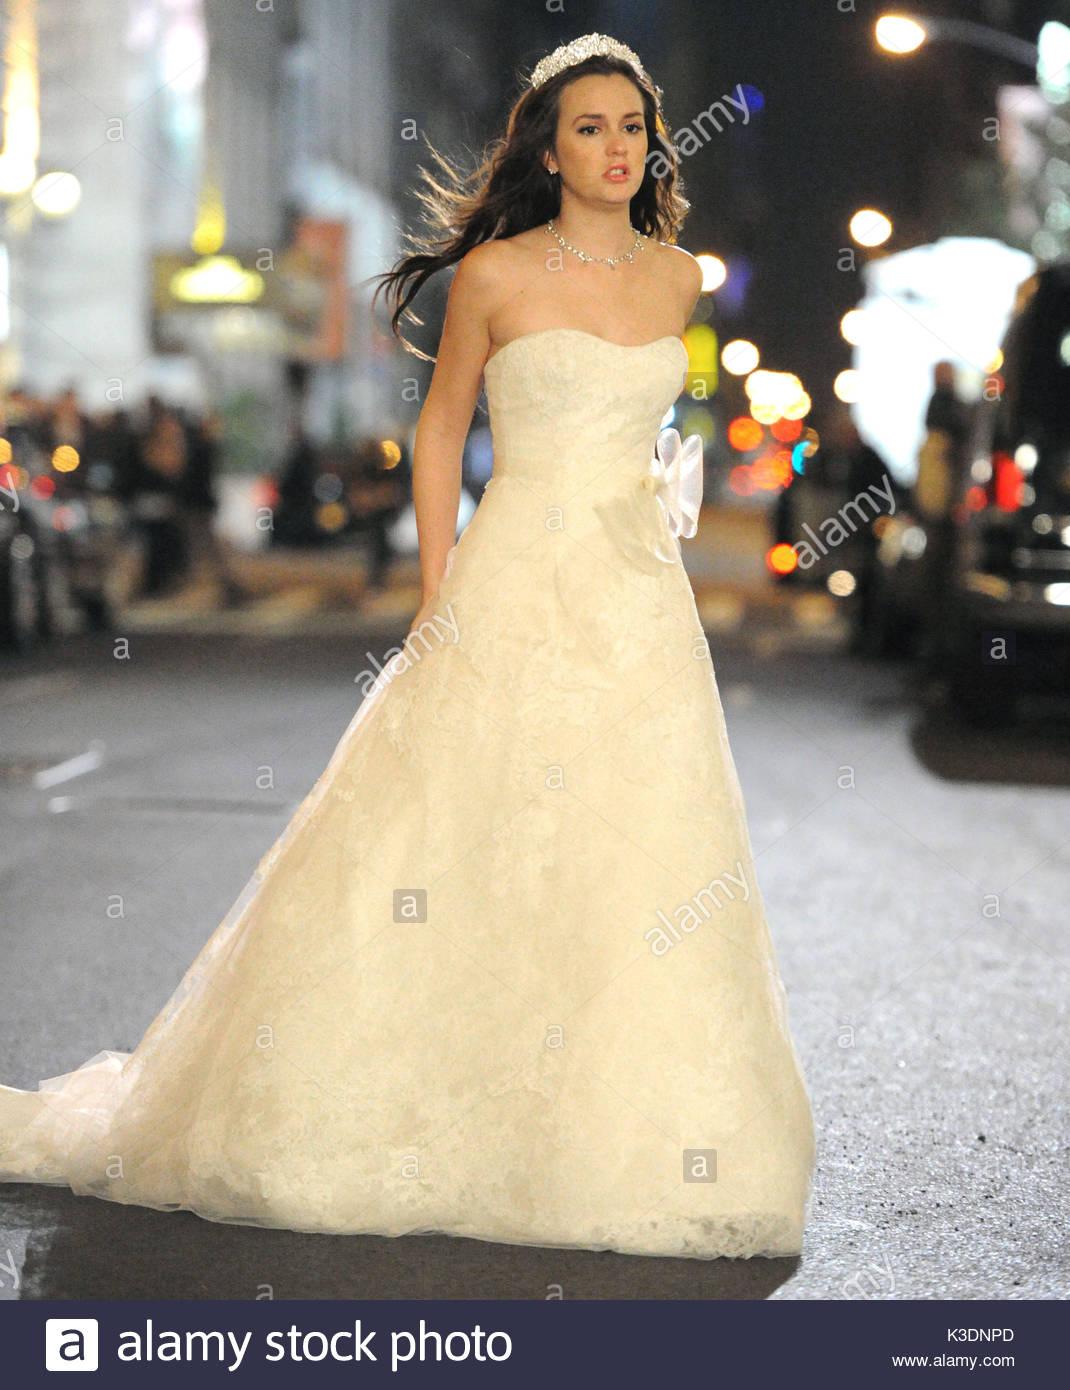 Leighton Meester. Leighton Meester wears a wedding dress while Stock ...